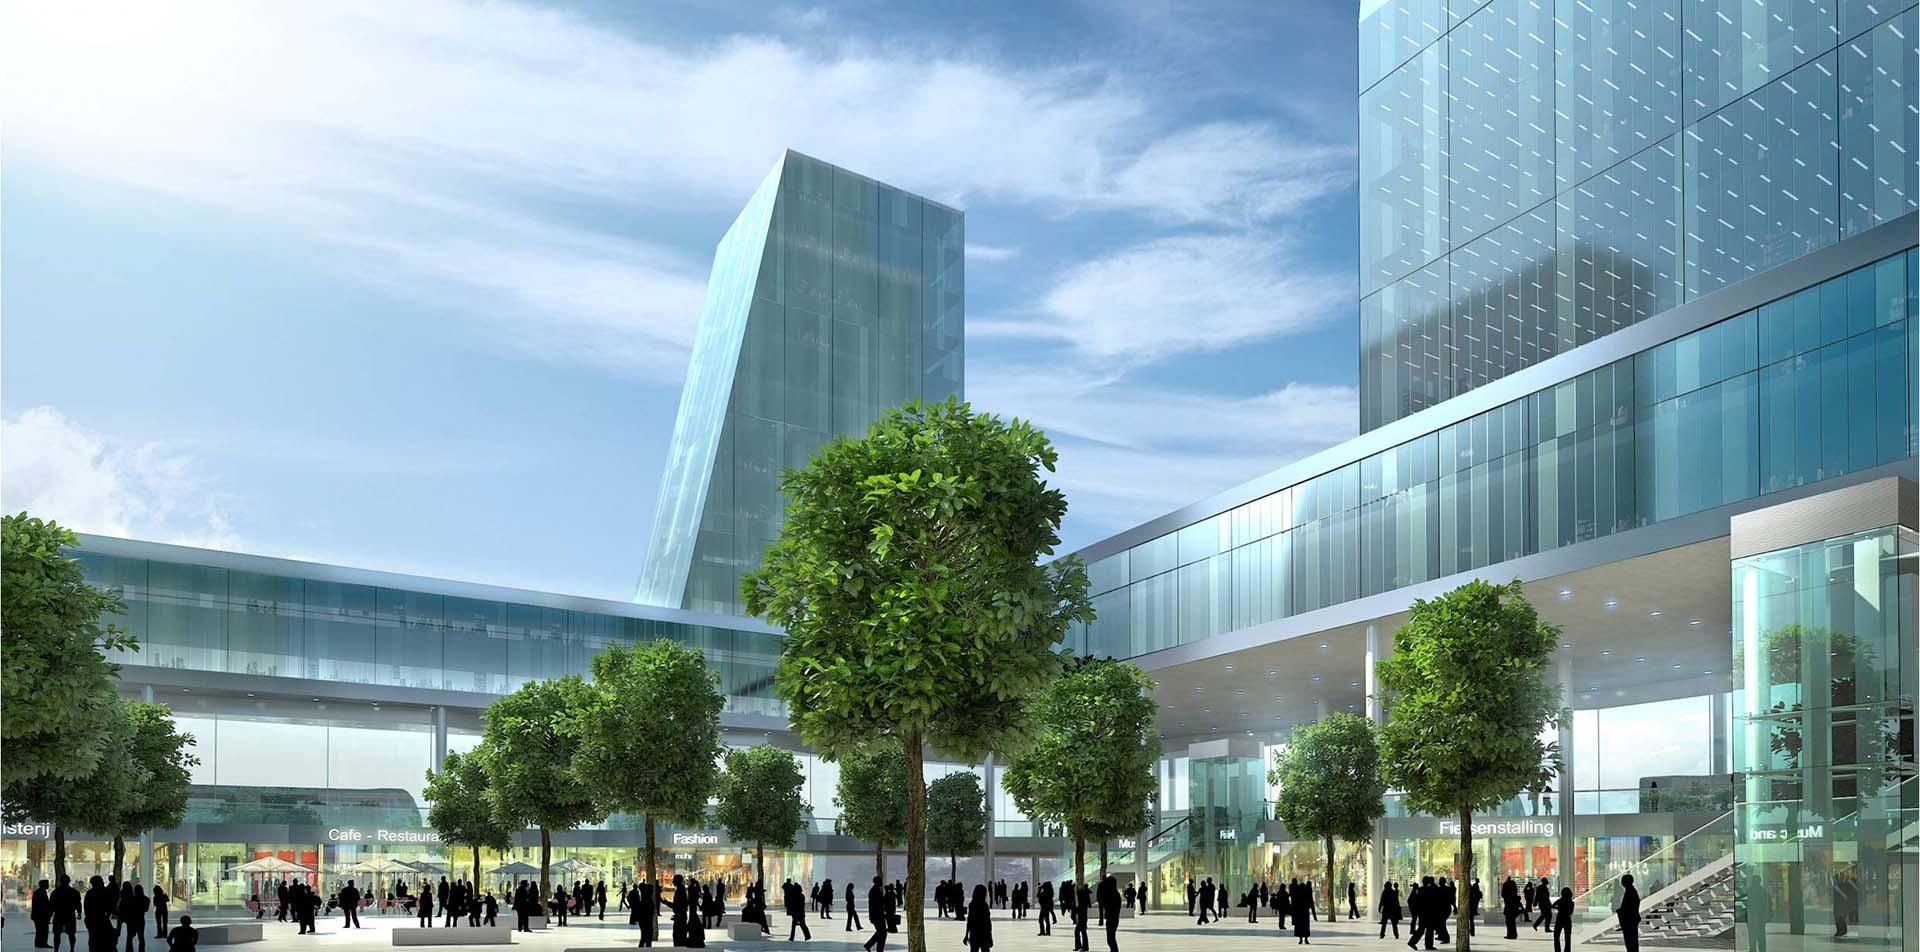 station-eindhoven-ontworpen-door-architect-rob-en-edwin-studiosk-movares-11111